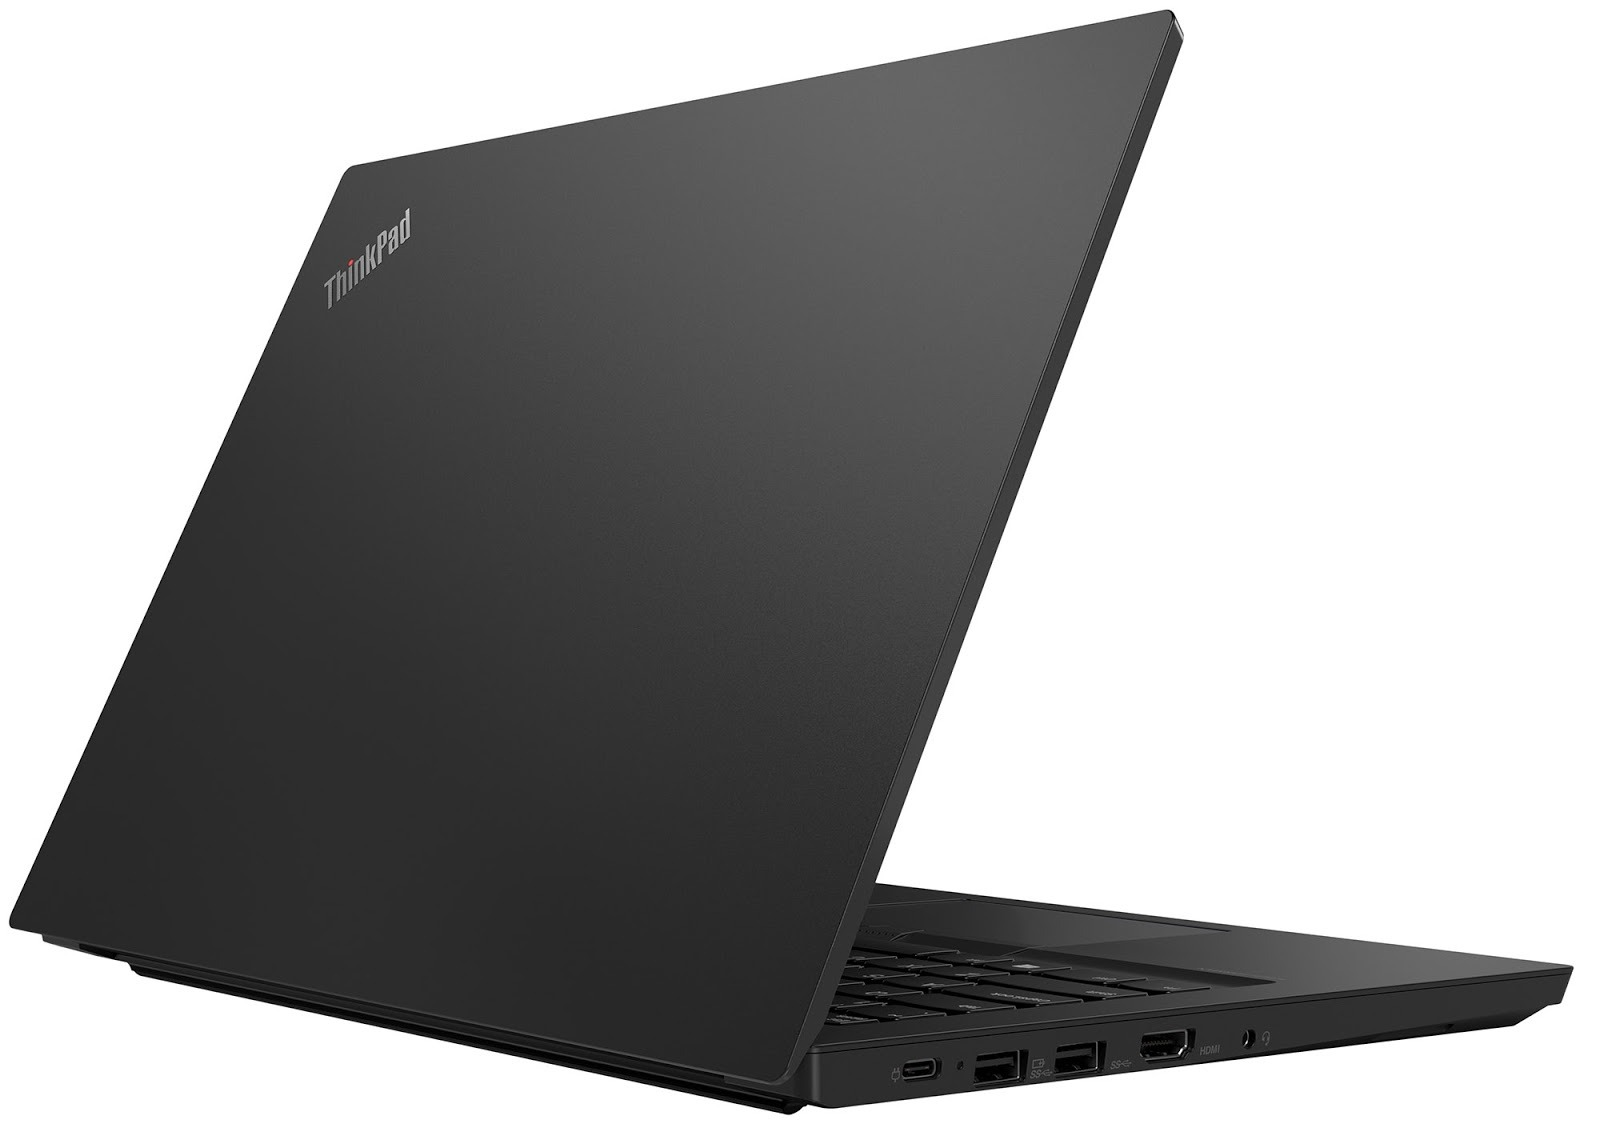 Фото 4. Ноутбук Lenovo ThinkPad E14 (20RA002SRT)